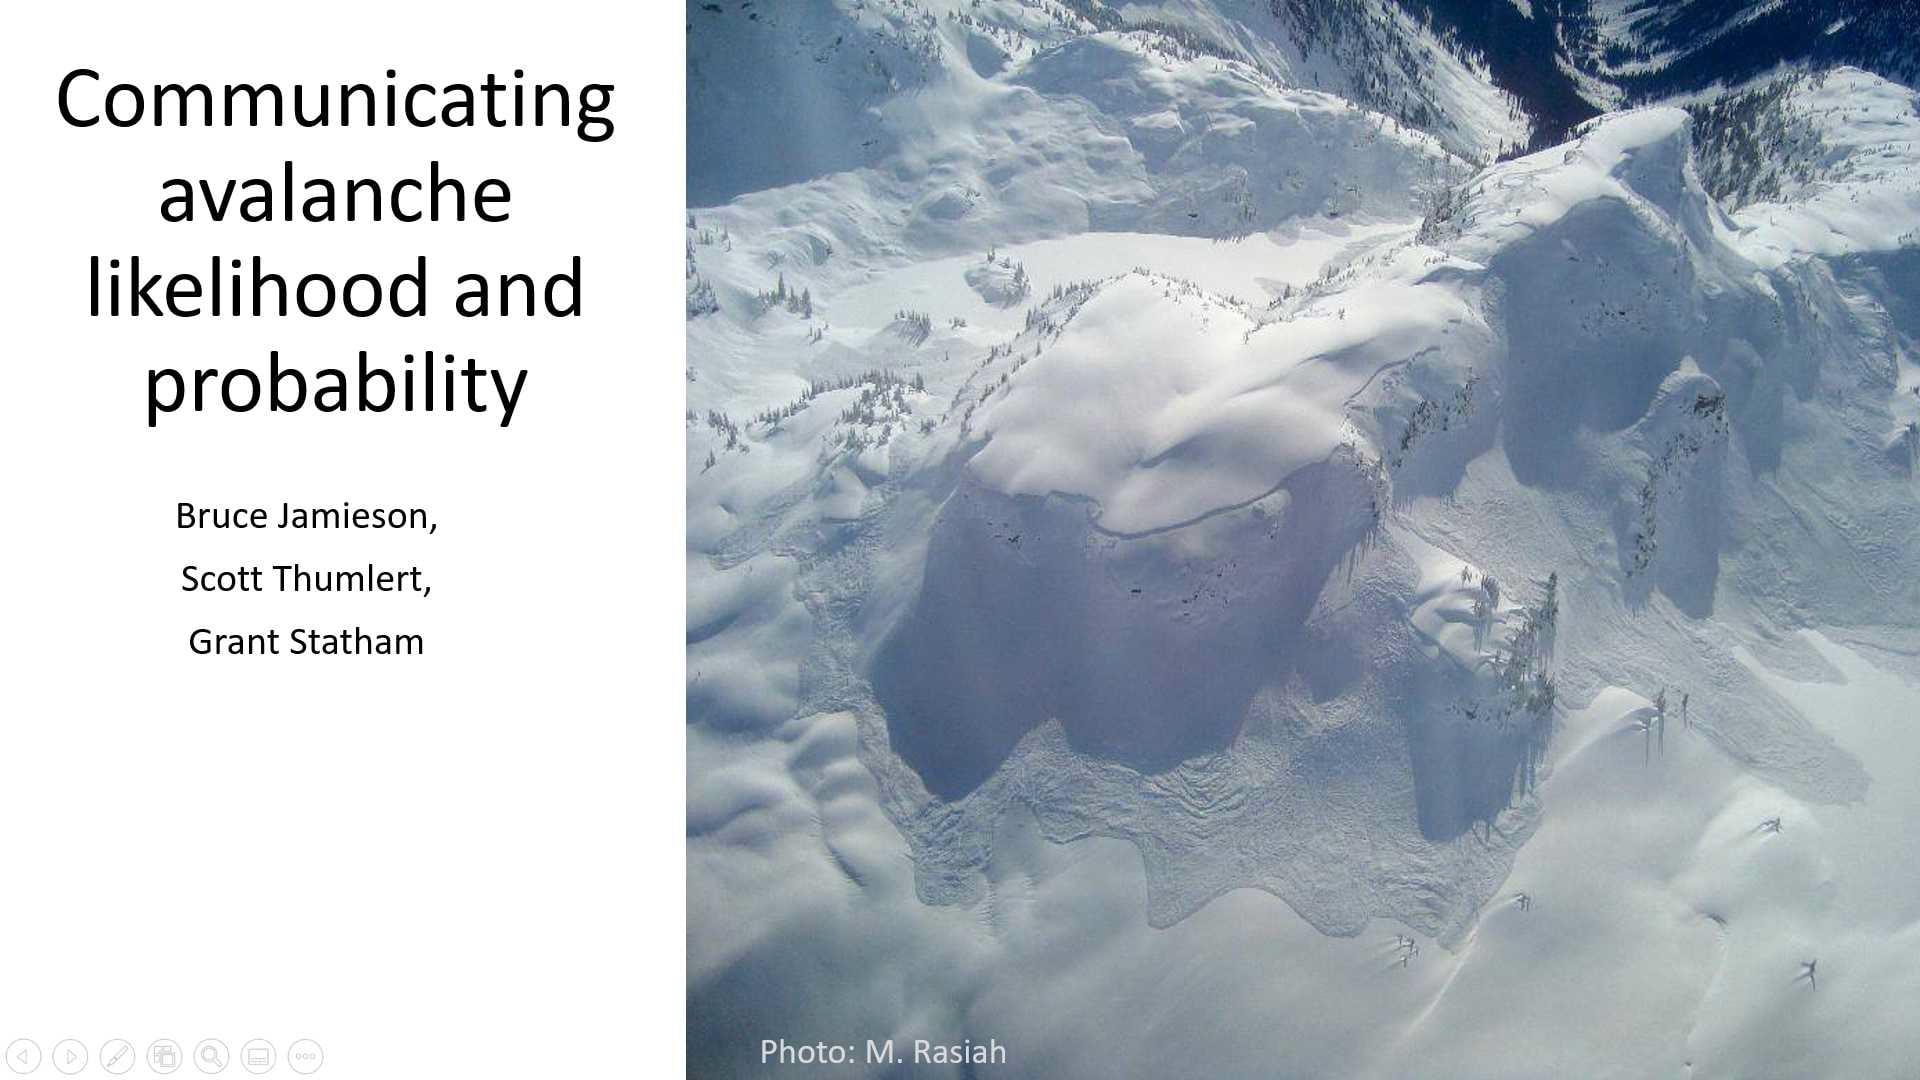 Communicating avalanche likelihood and probability